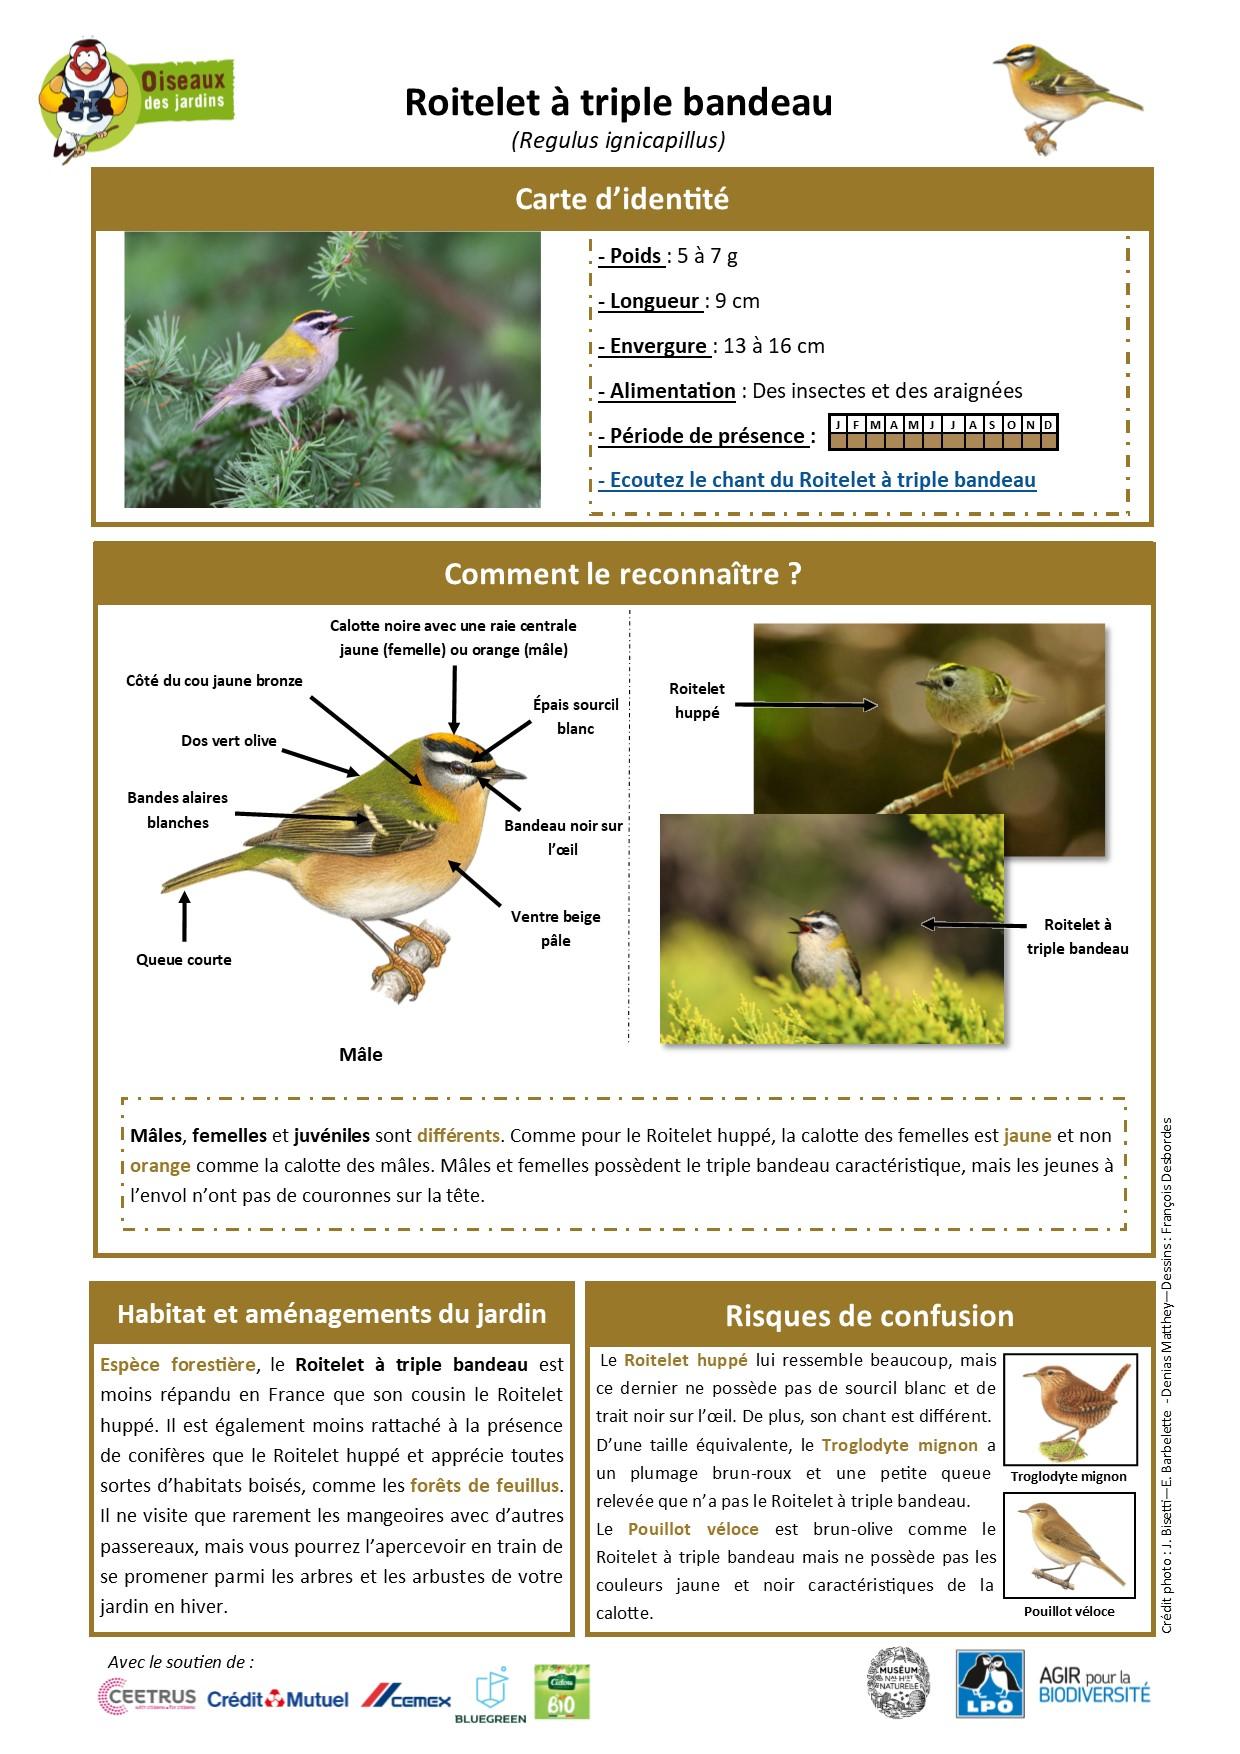 https://cdnfiles1.biolovision.net/www.oiseauxdesjardins.fr/userfiles/Fichesespces/FicheespceRTB.jpg